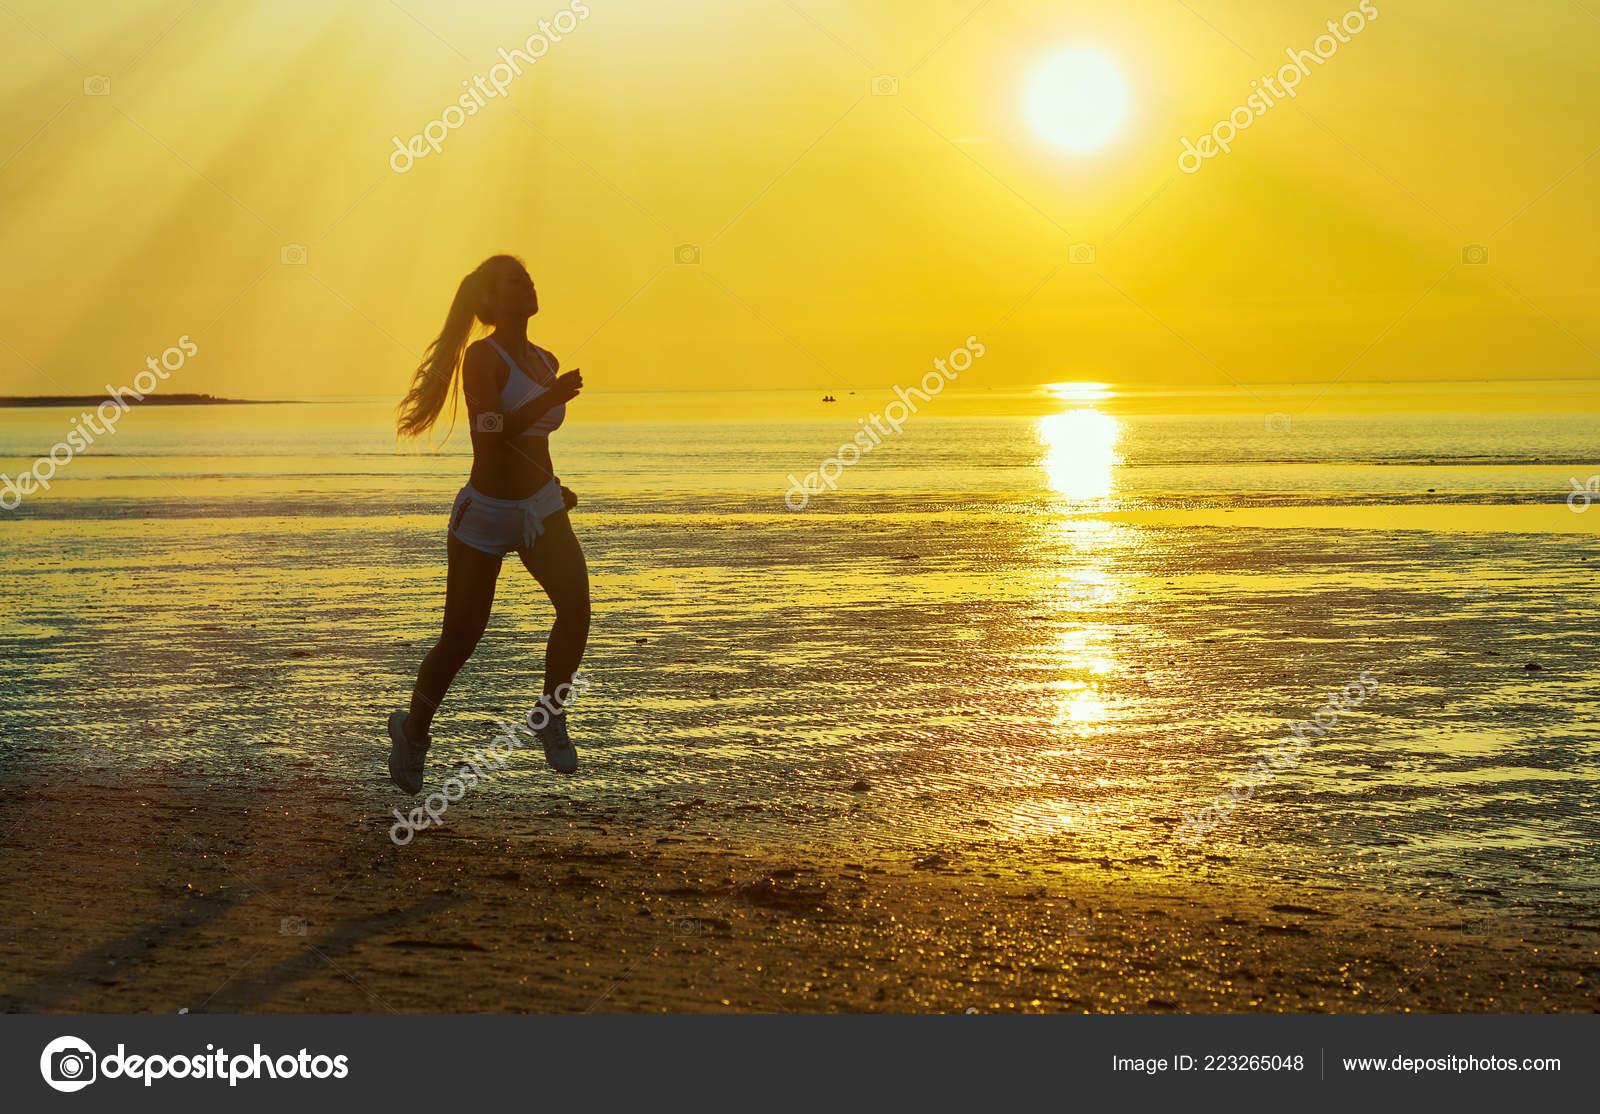 Silhouette Girl Running Sea Beach Sunrise Sunset Black Beach